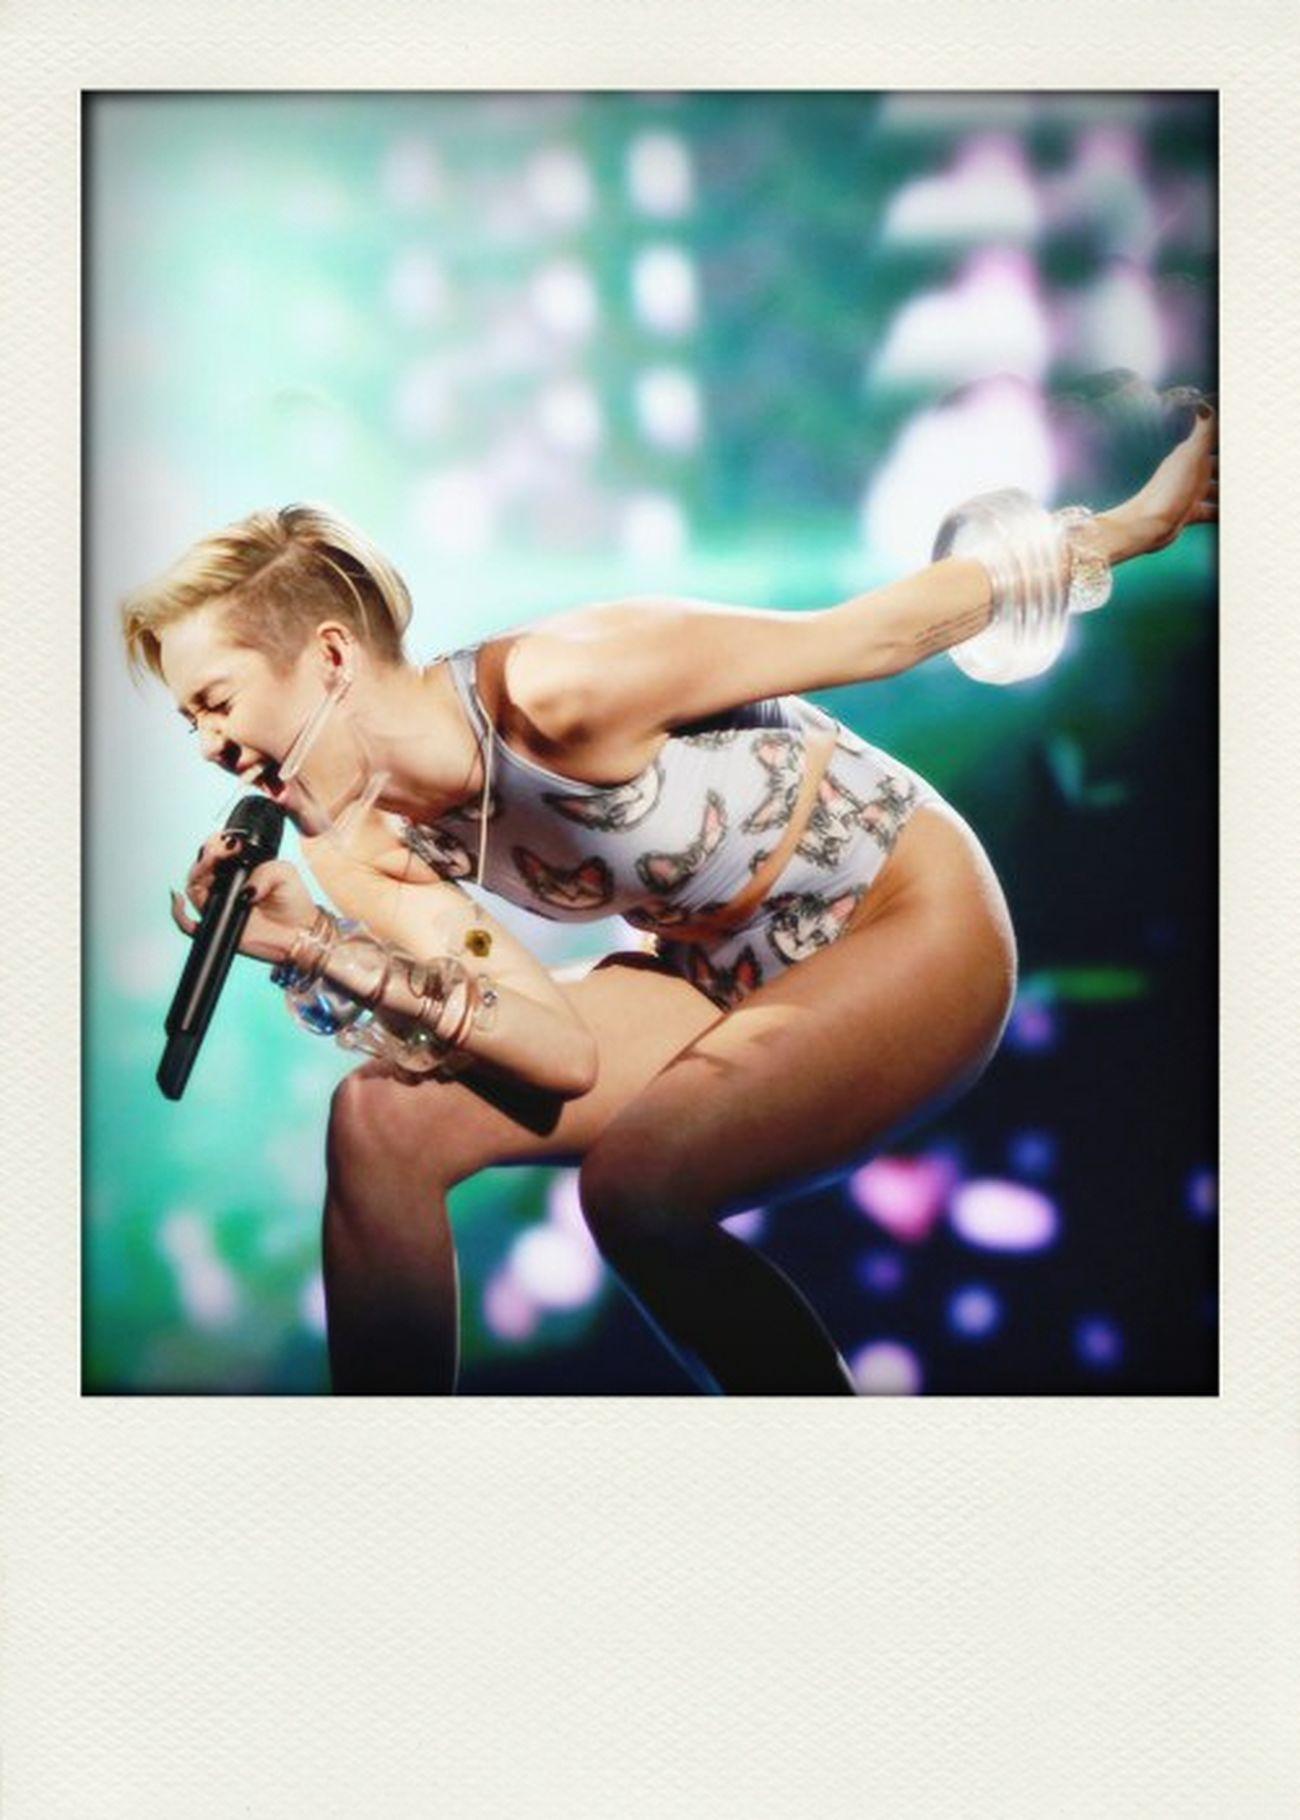 MileyCyrus #wecantstop